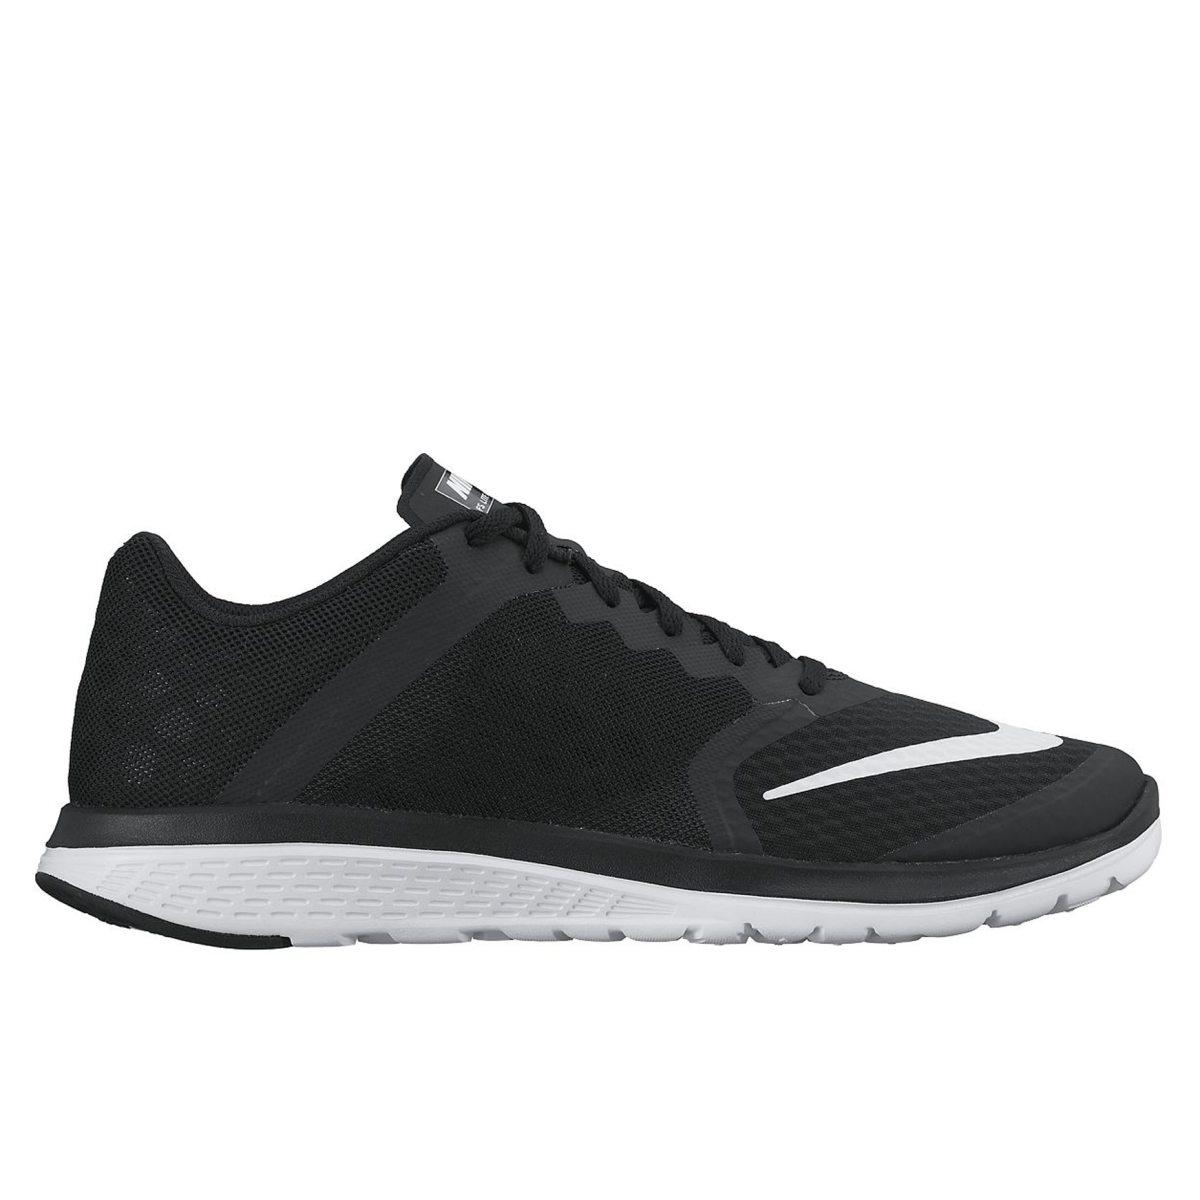 nike free köpa nike skor billigt, RL6608 Nike Roshe Run